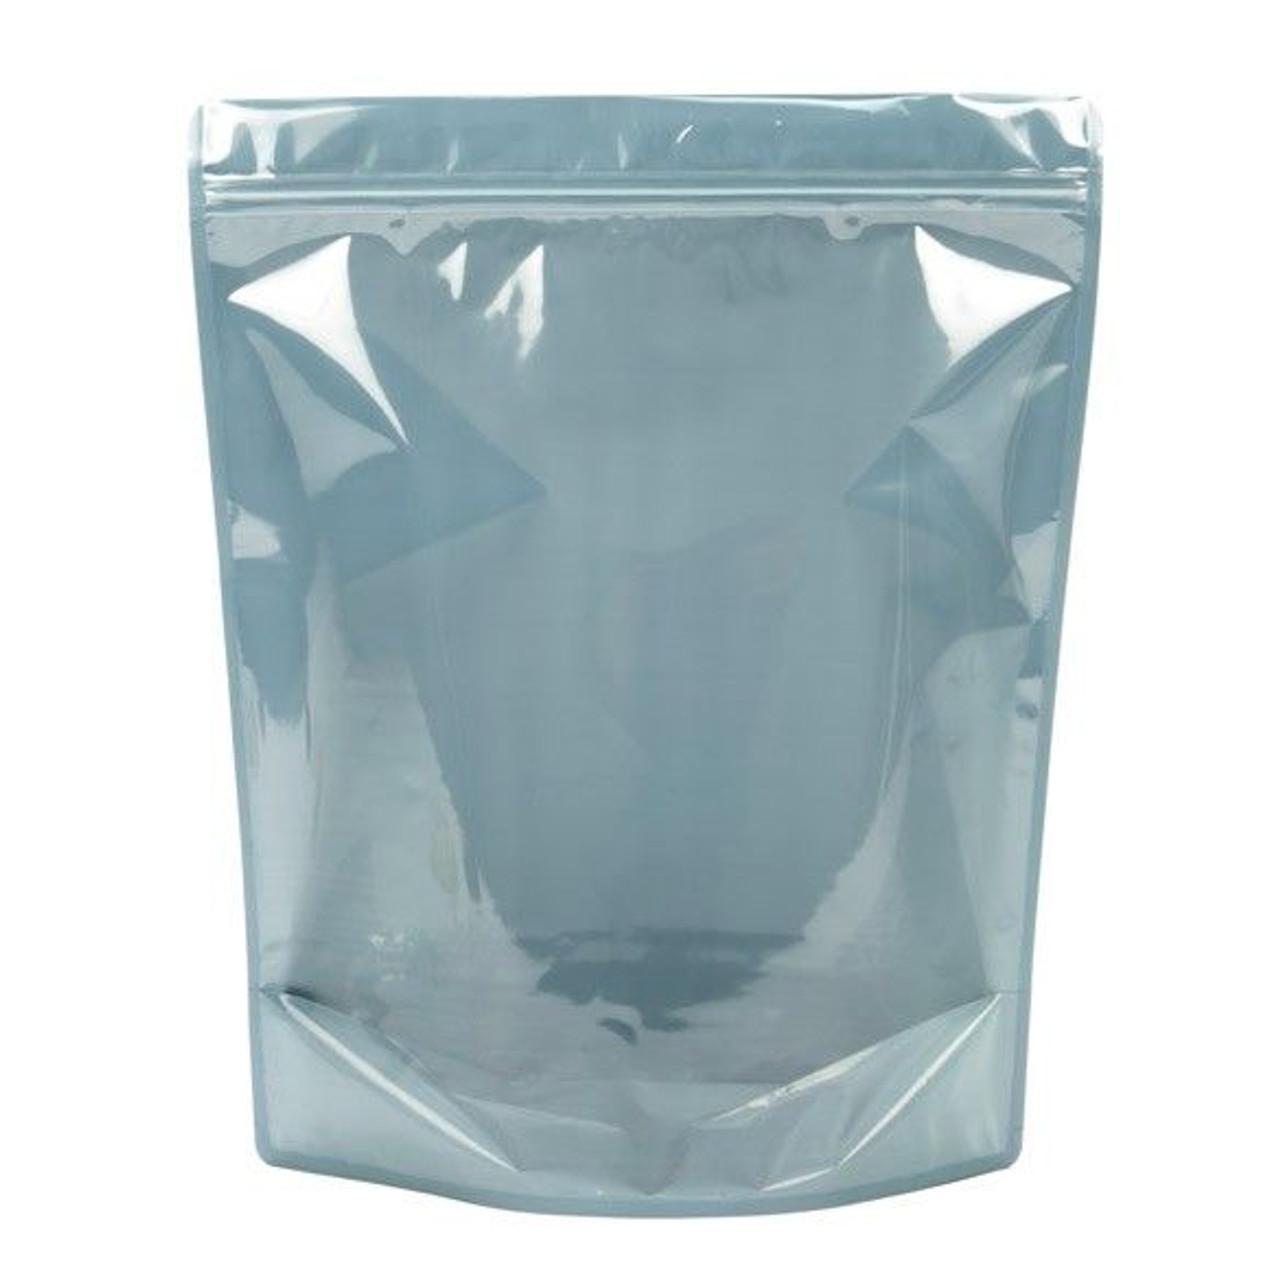 100 White//Clear Mylar Bags Resealable Ziplock SINGLE GRAM